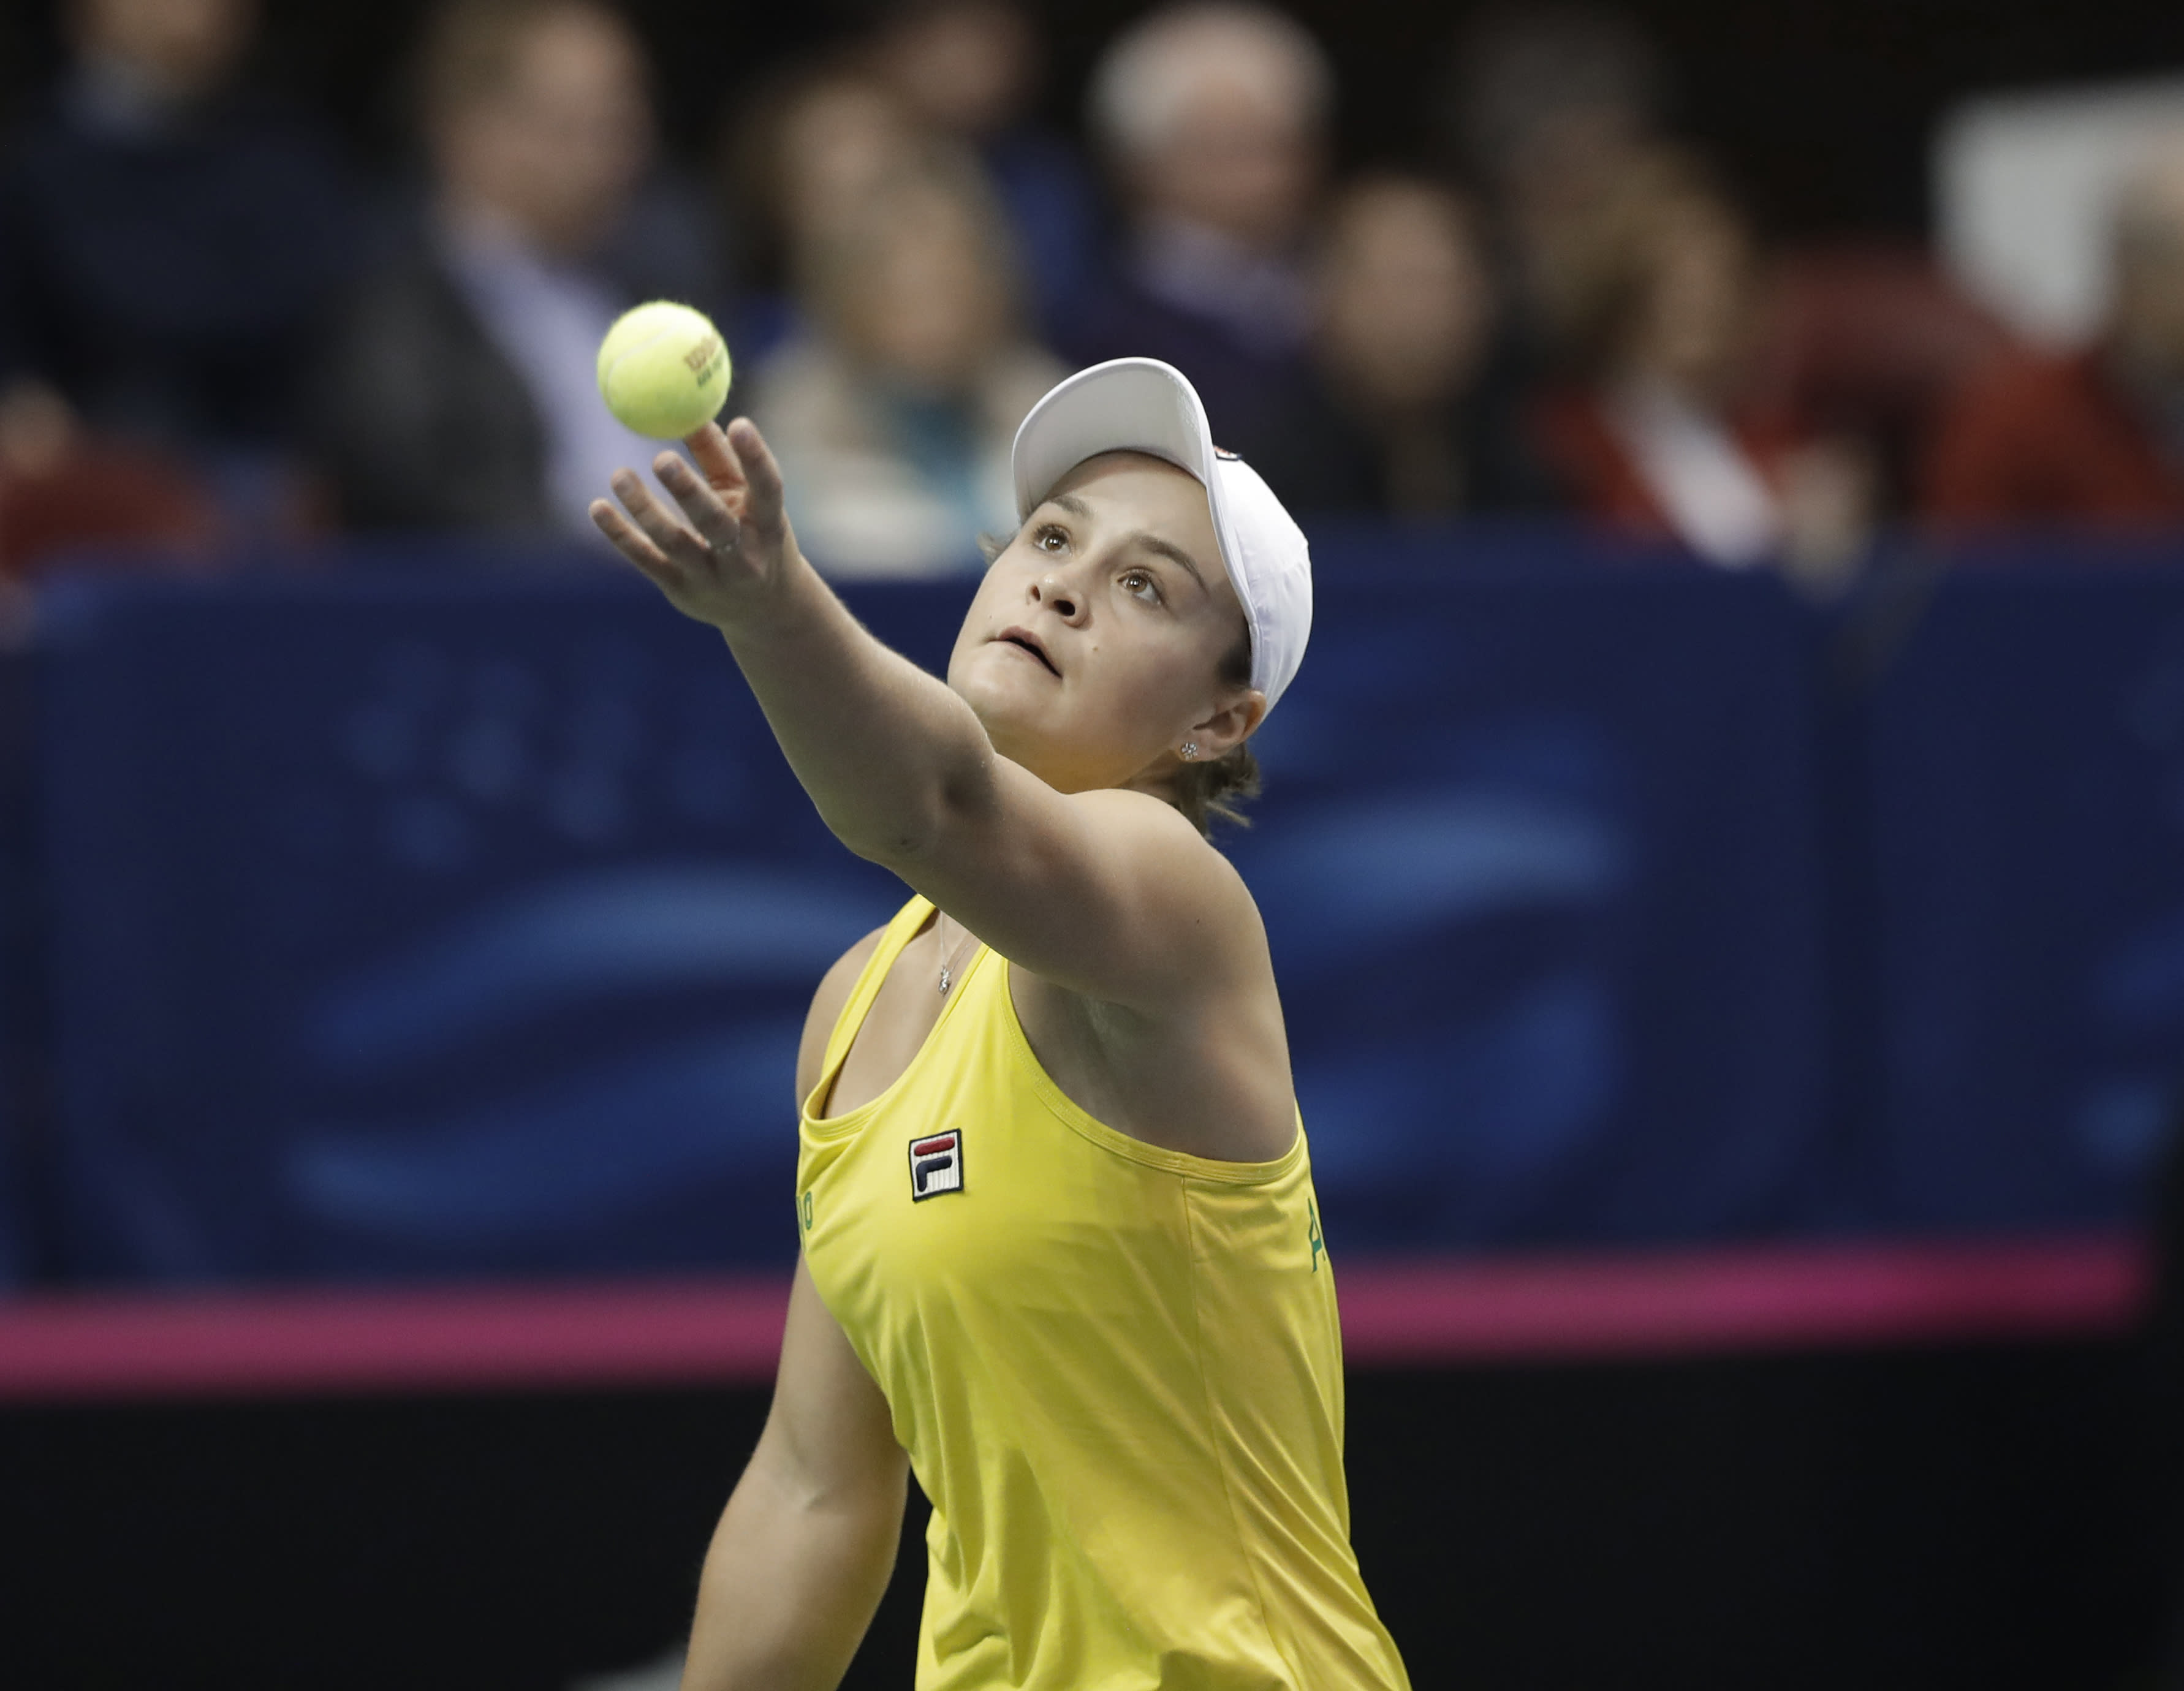 Romania upsets Czechs in Fed Cup, Australia beats US